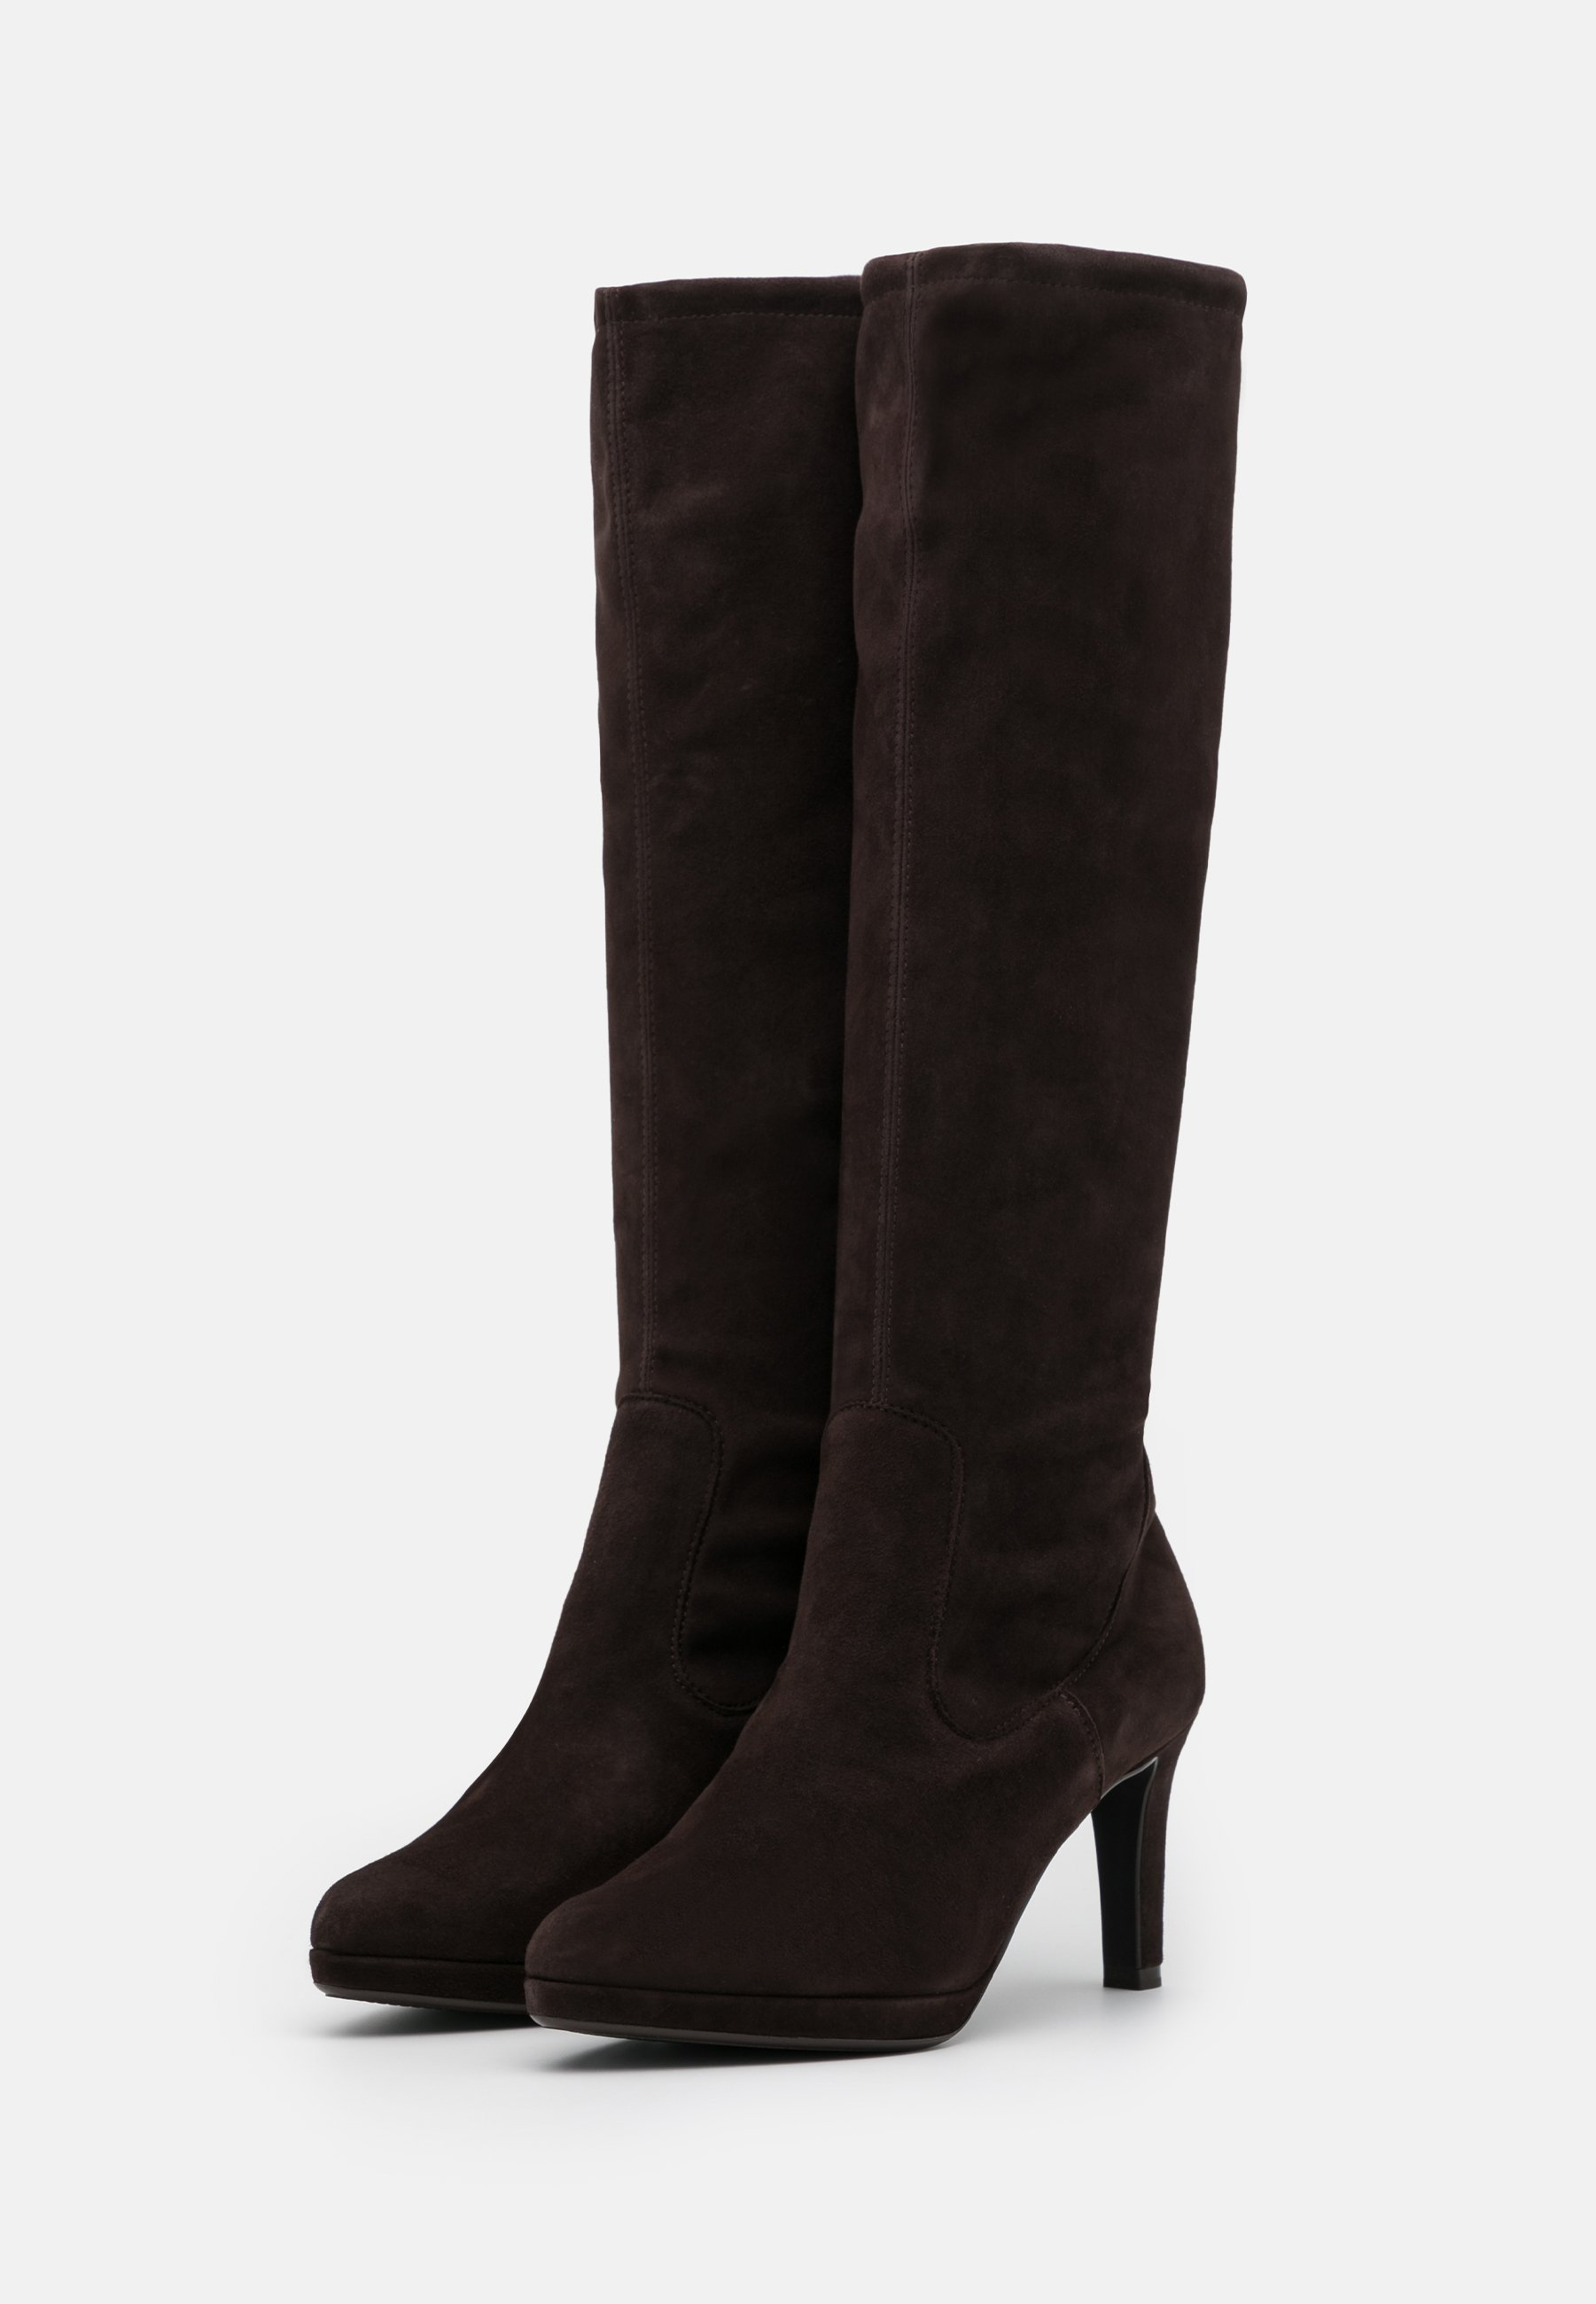 Latest Excellent Women's Shoes Peter Kaiser PAULINE High heeled boots dark brown kM4cbPfNW lAjF9mUG8